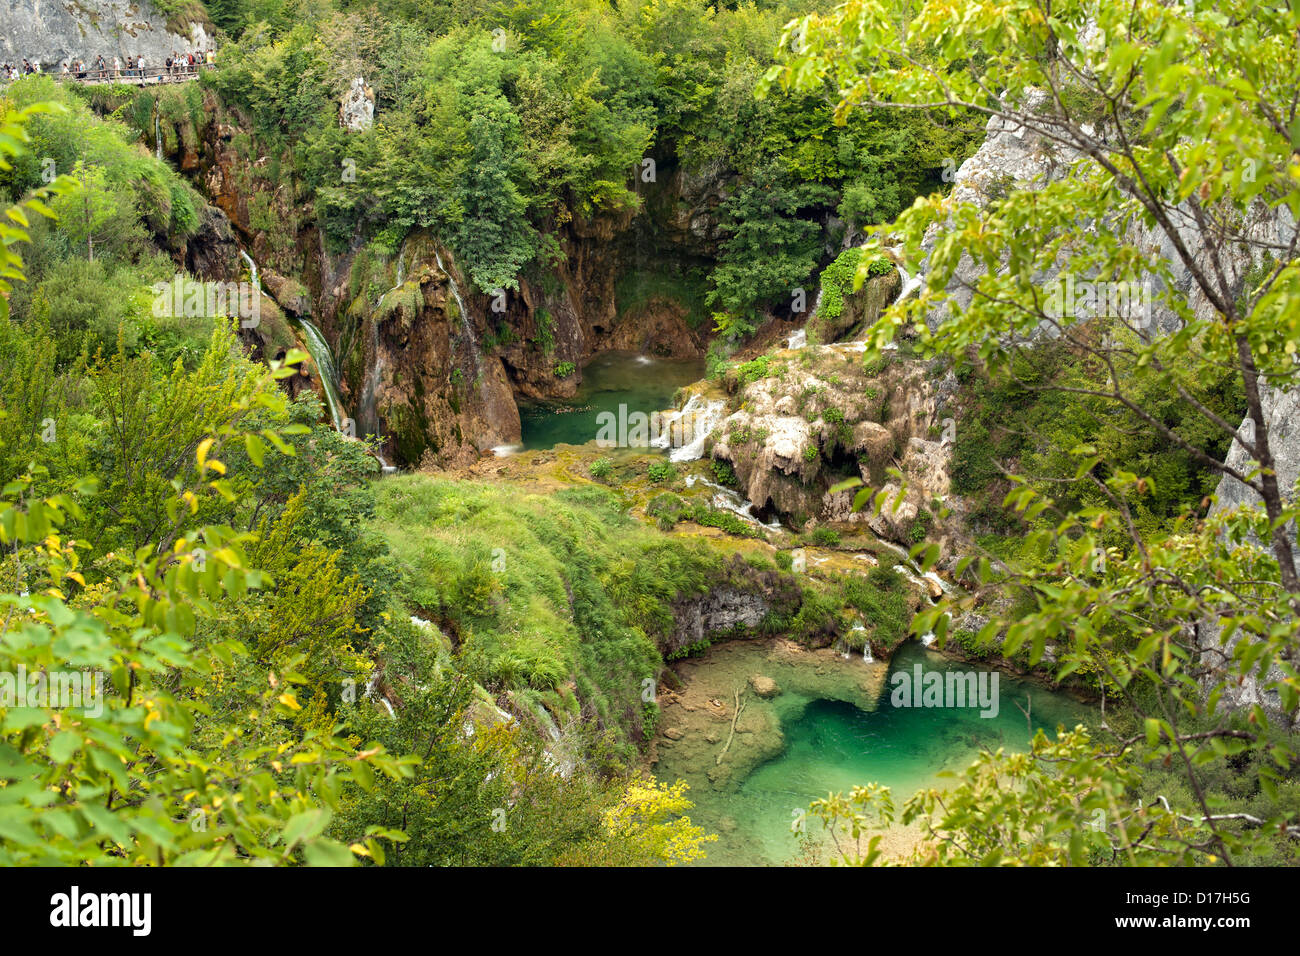 Plitvice Lakes National Park in Croatia. - Stock Image